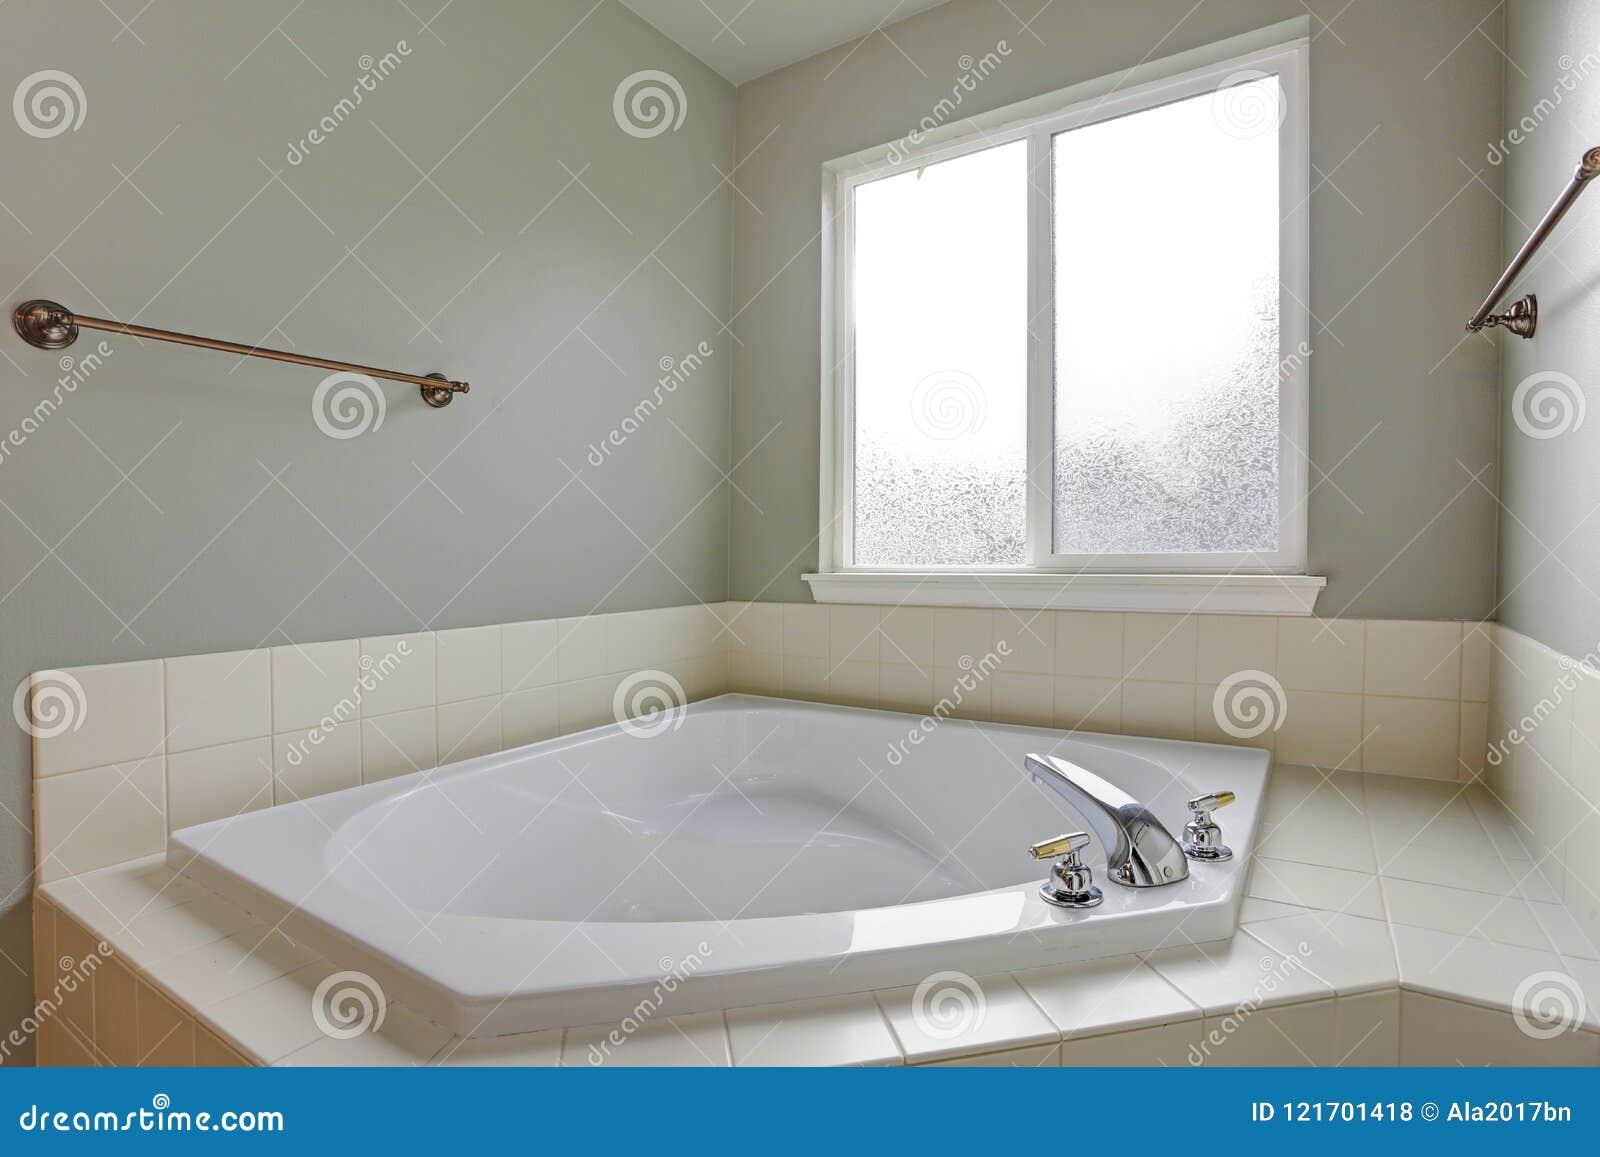 Bathroom Nook Features White Corner Tub Stock Photo - Image of ...